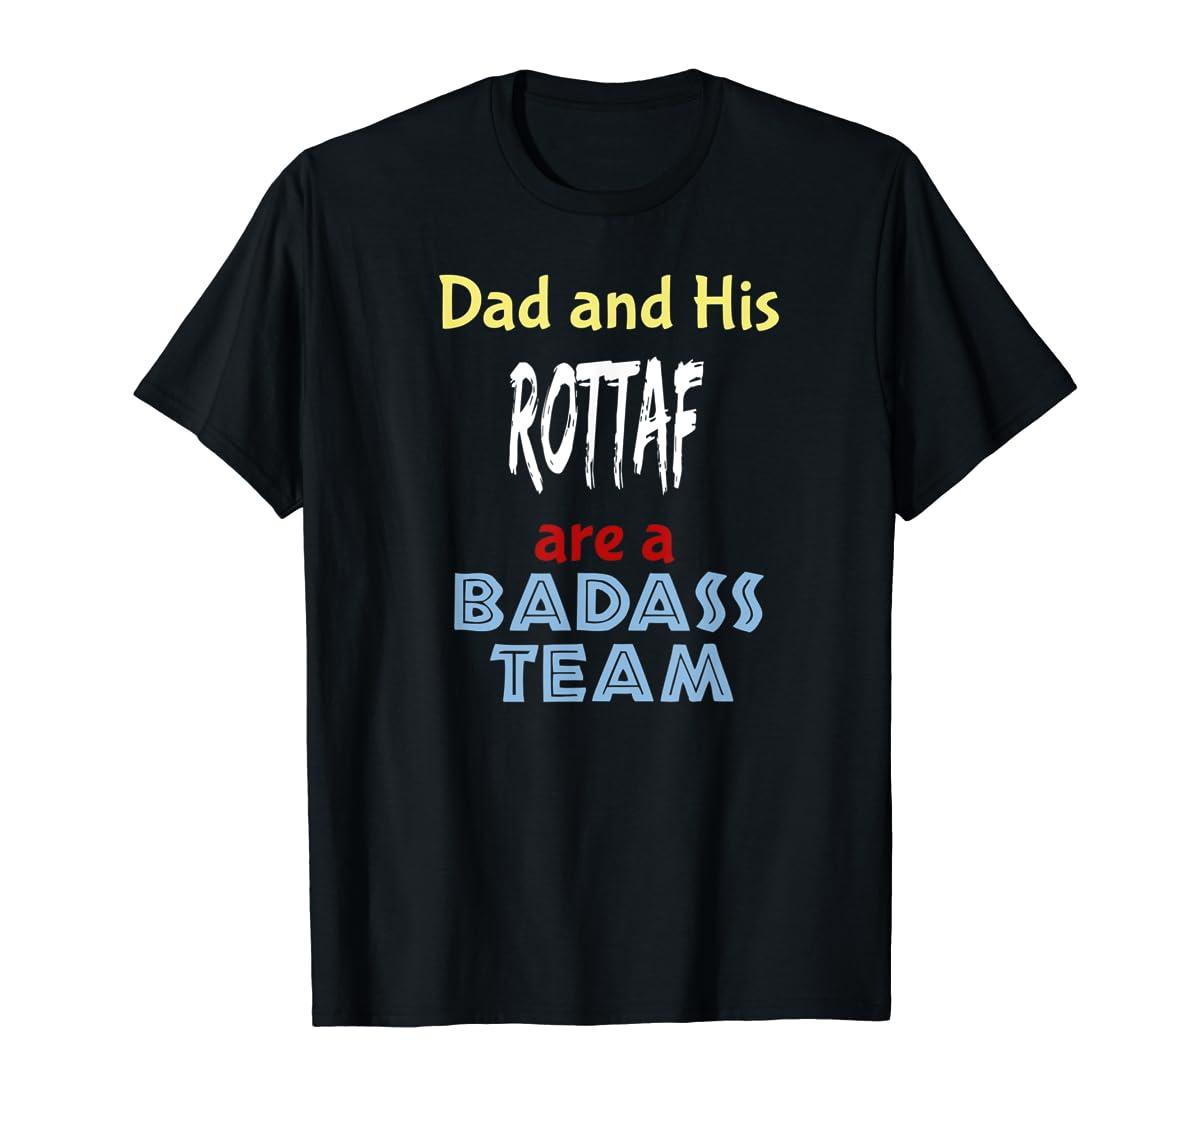 Mens Rottaf Dog Shirt Love Rottweiler + Afghan Hound =  T-Shirt-Men's T-Shirt-Black